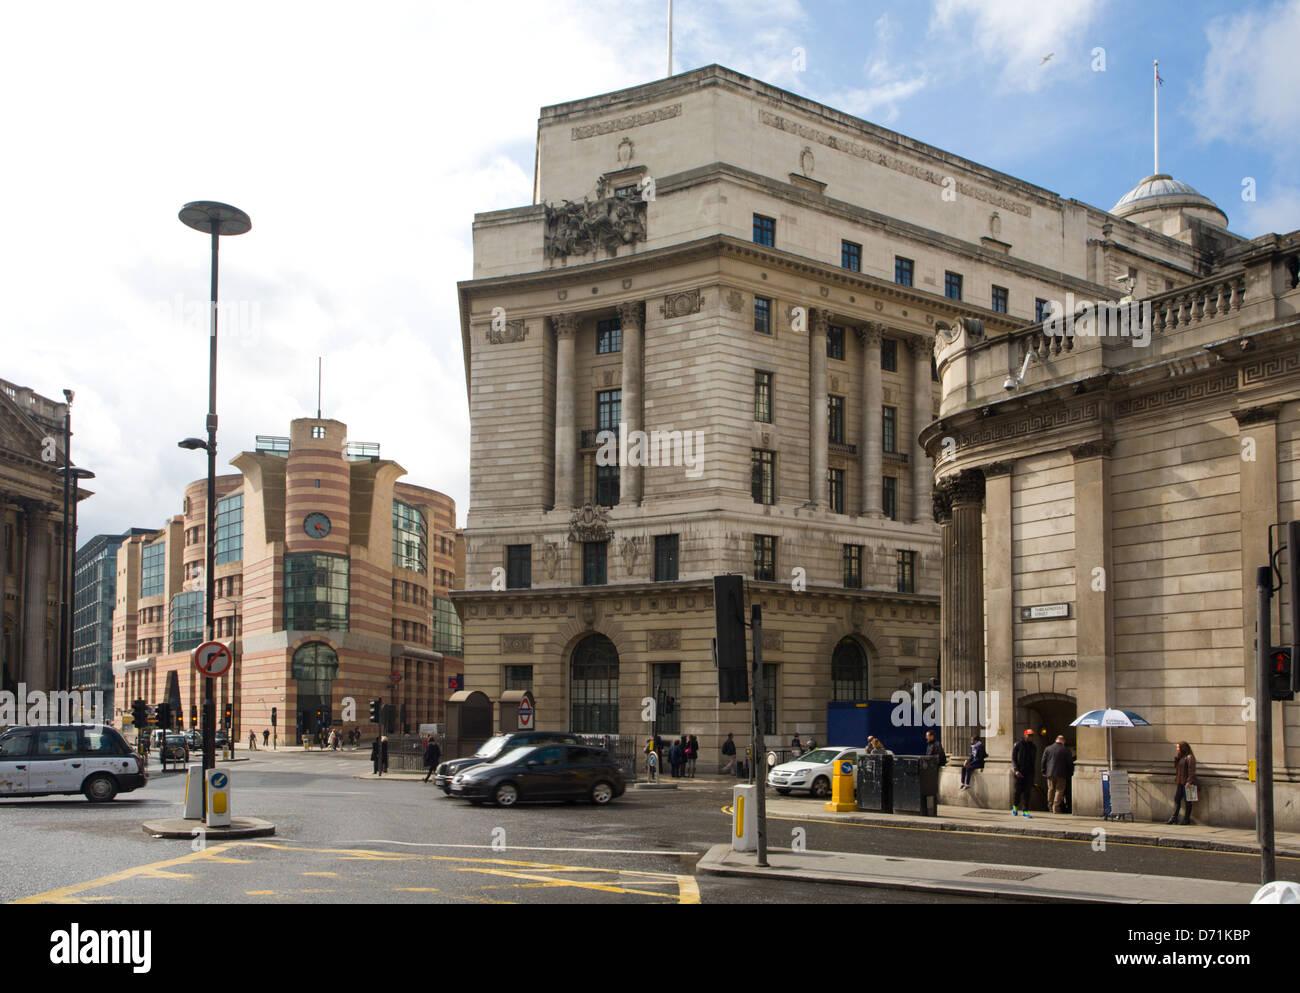 Threadneedle Street, Princes street and Bank underground station - Stock Image